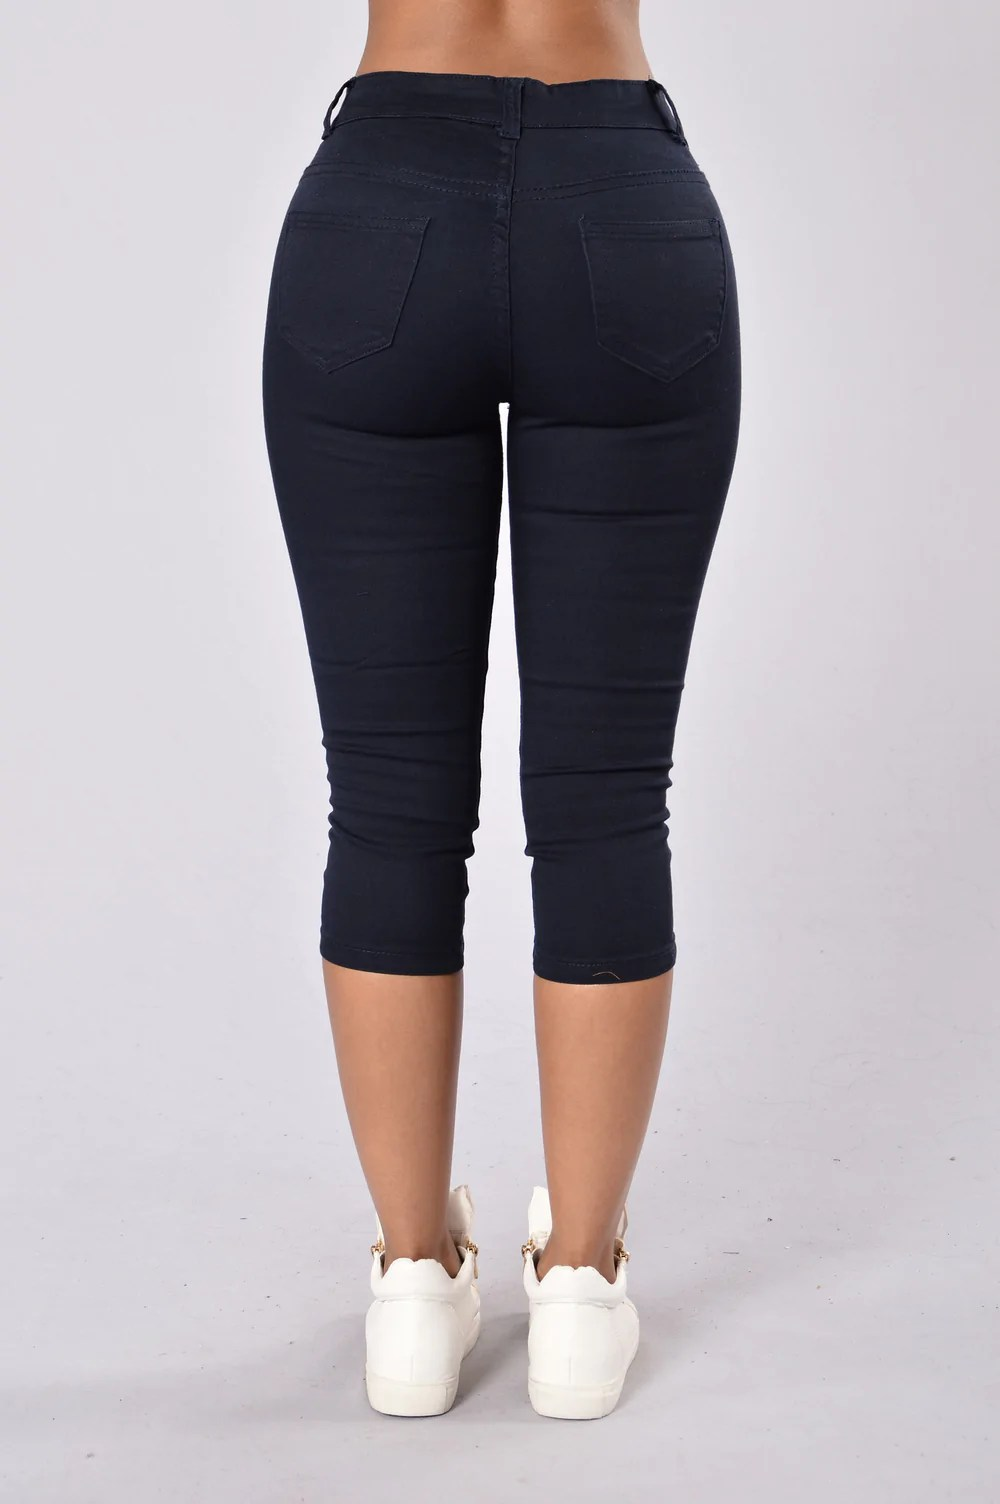 Capri Uniform Pants - Navy